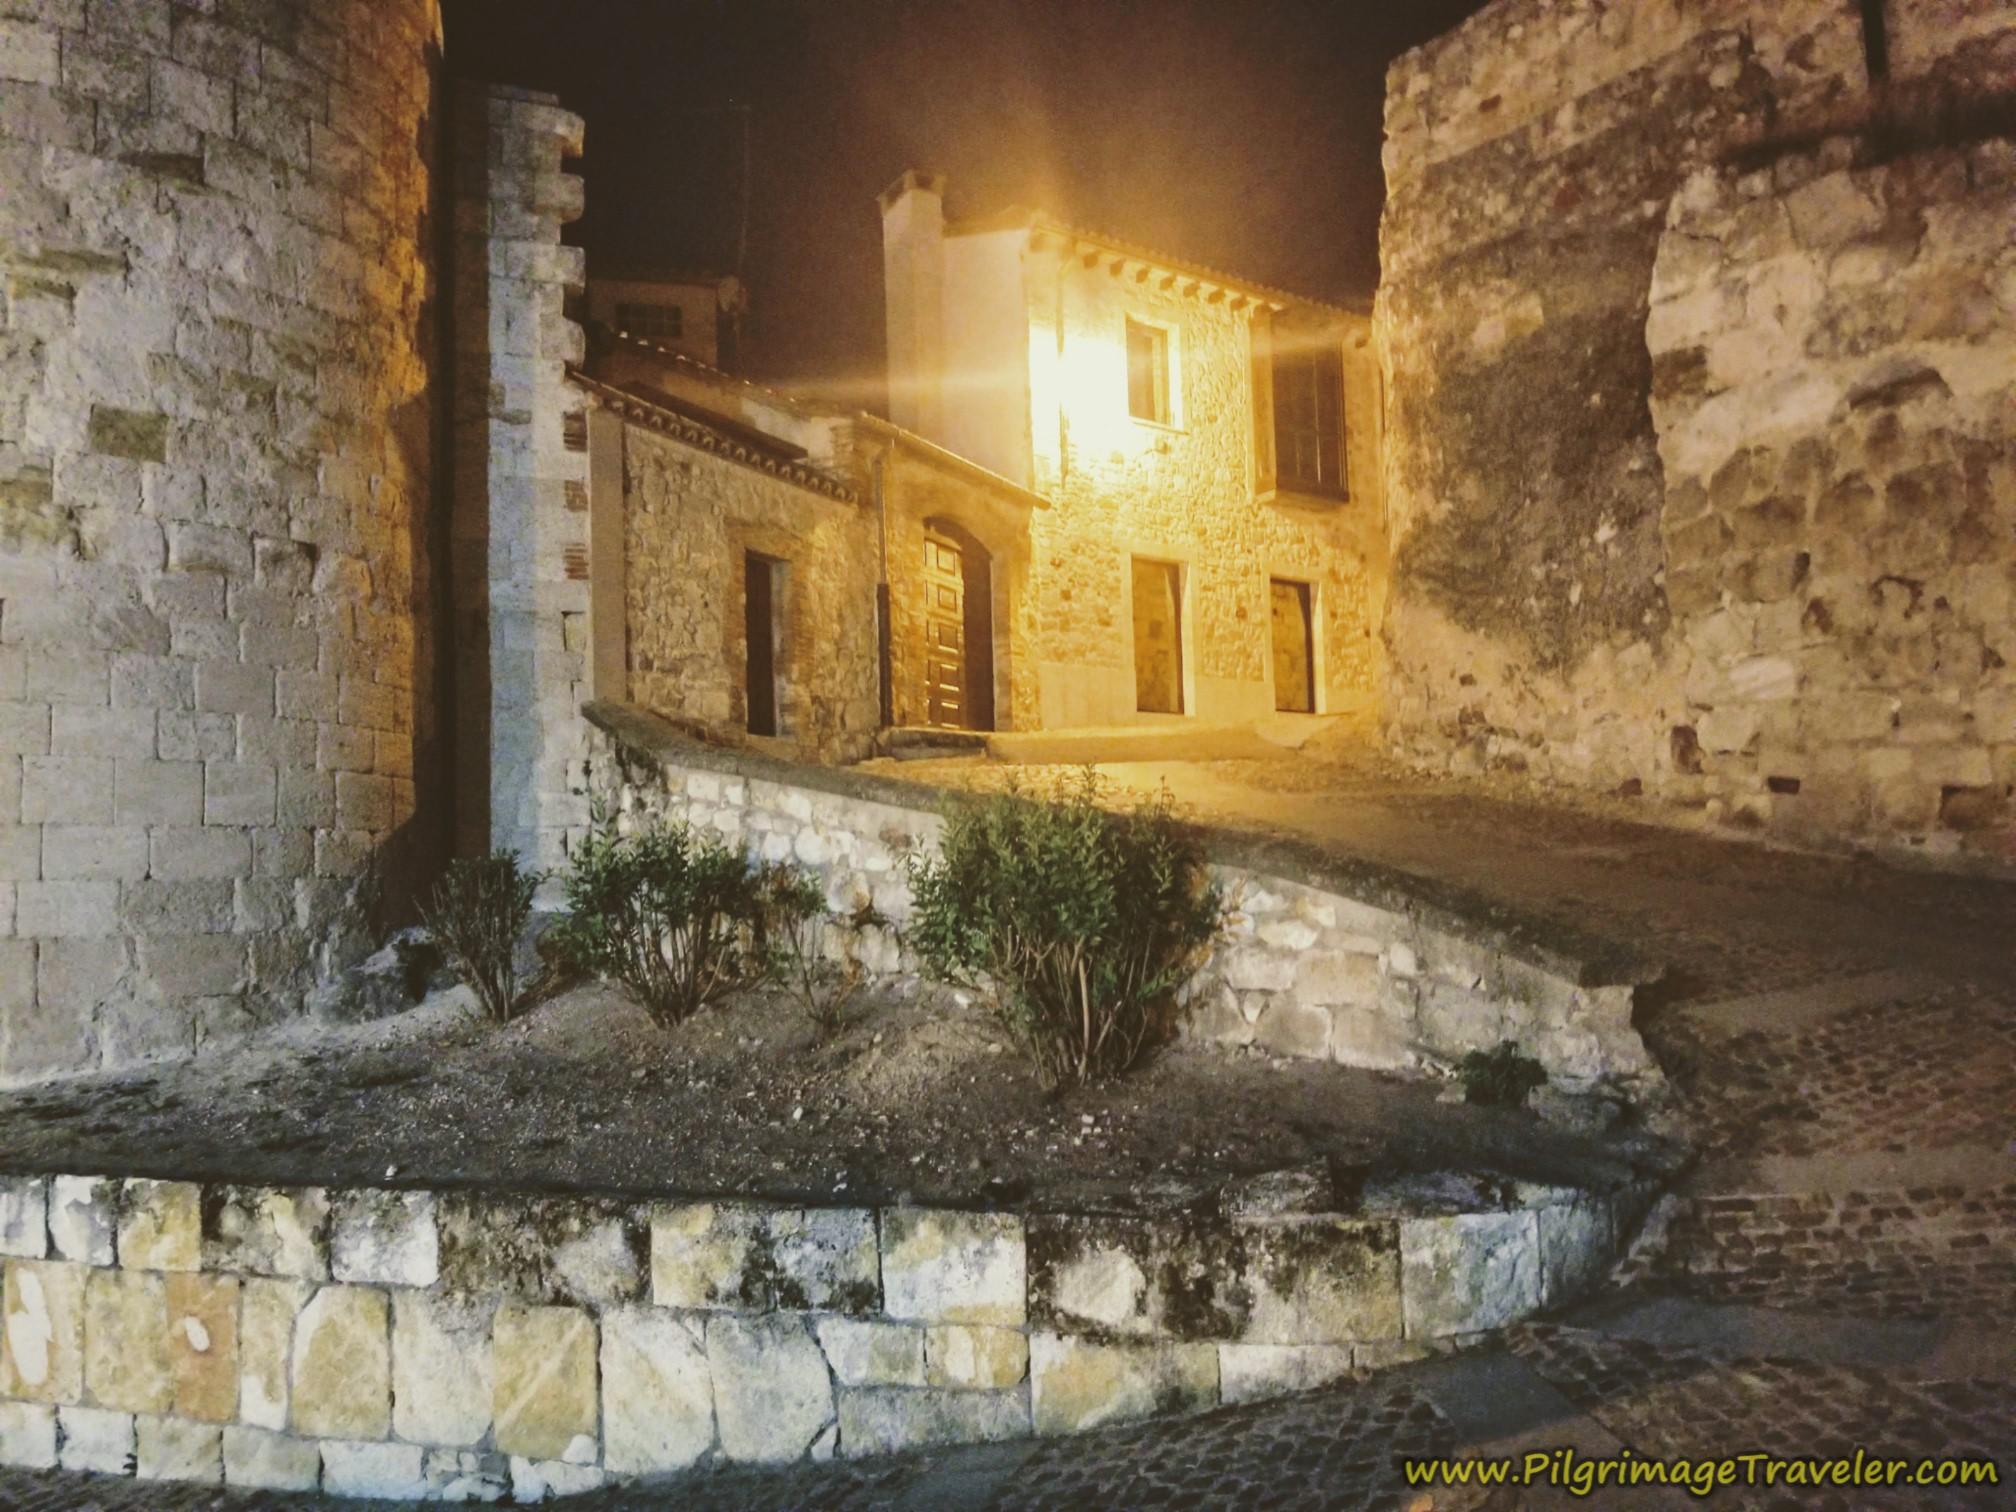 Leaving Zamora Through Medieval Walls